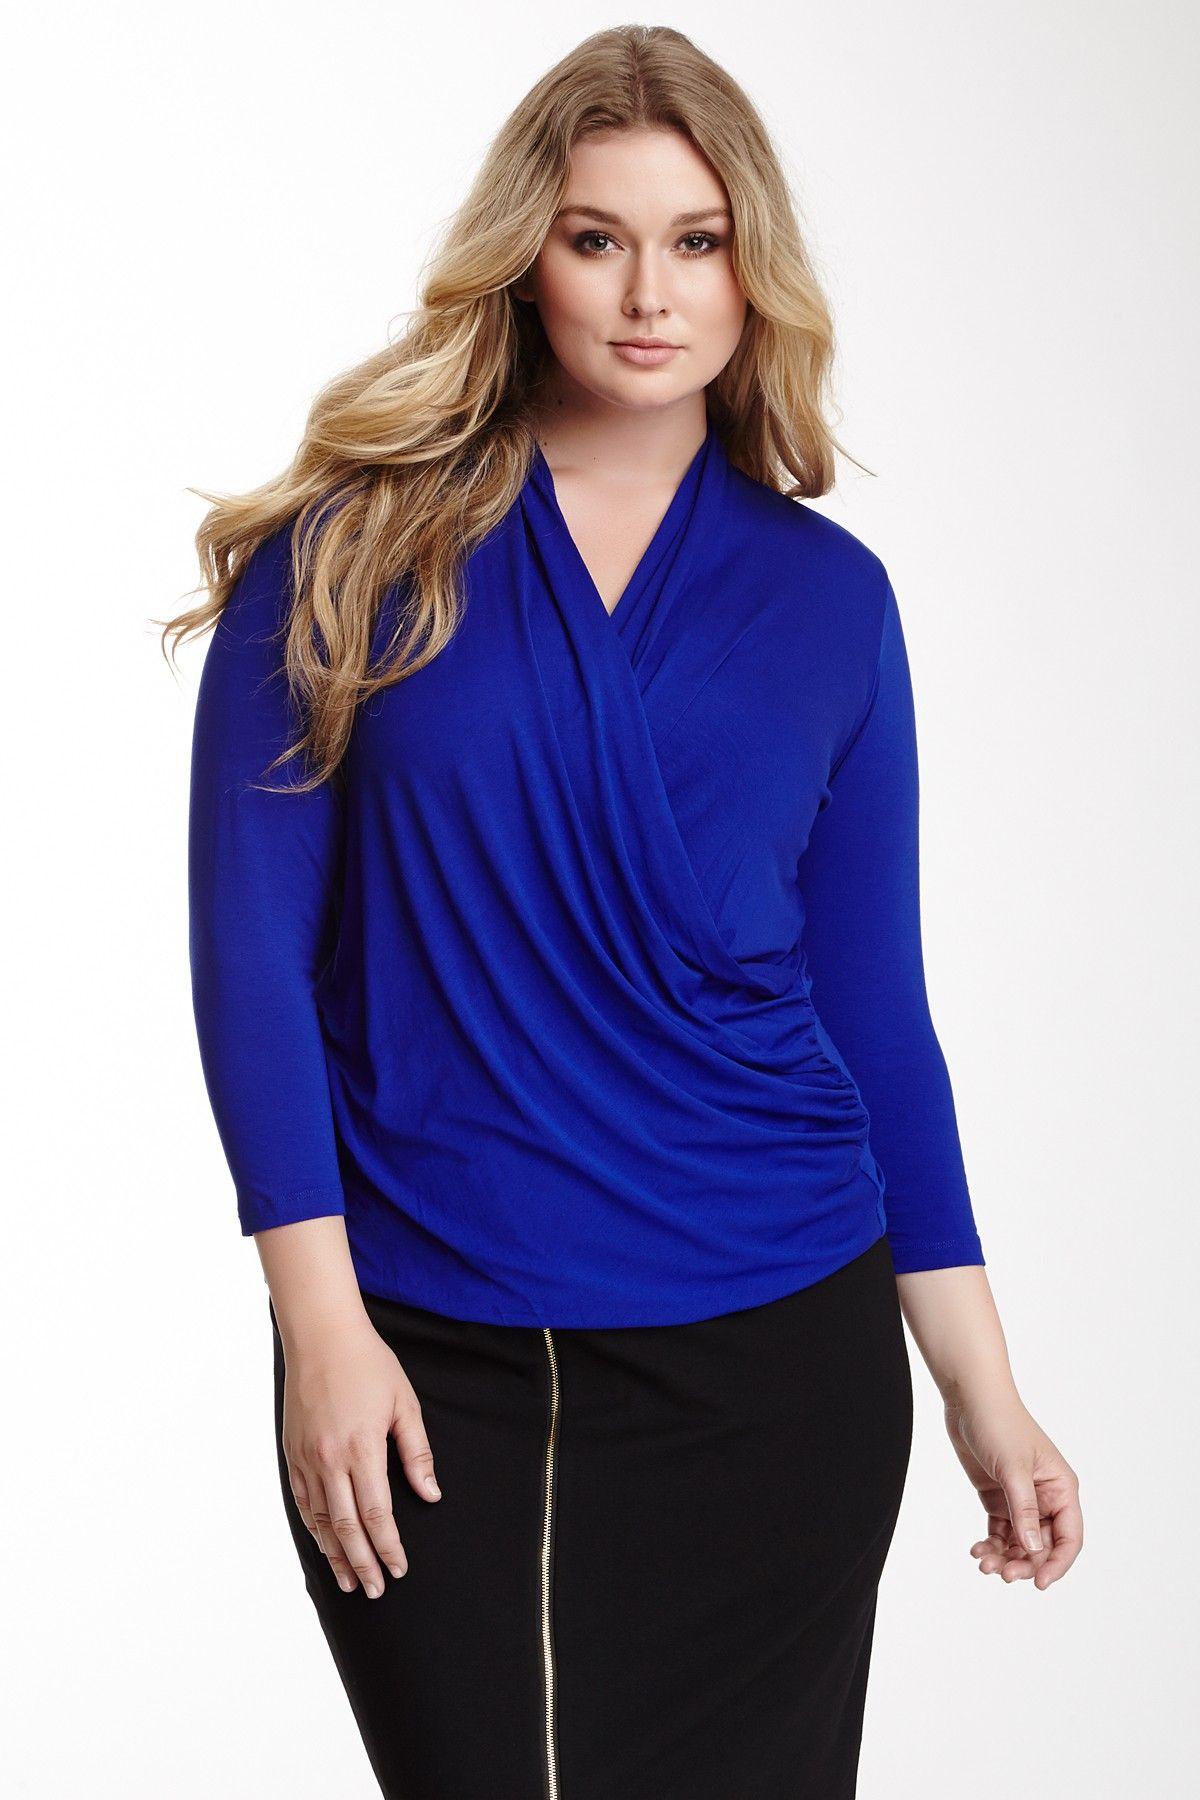 how to measure for a dress shirt sleeve length